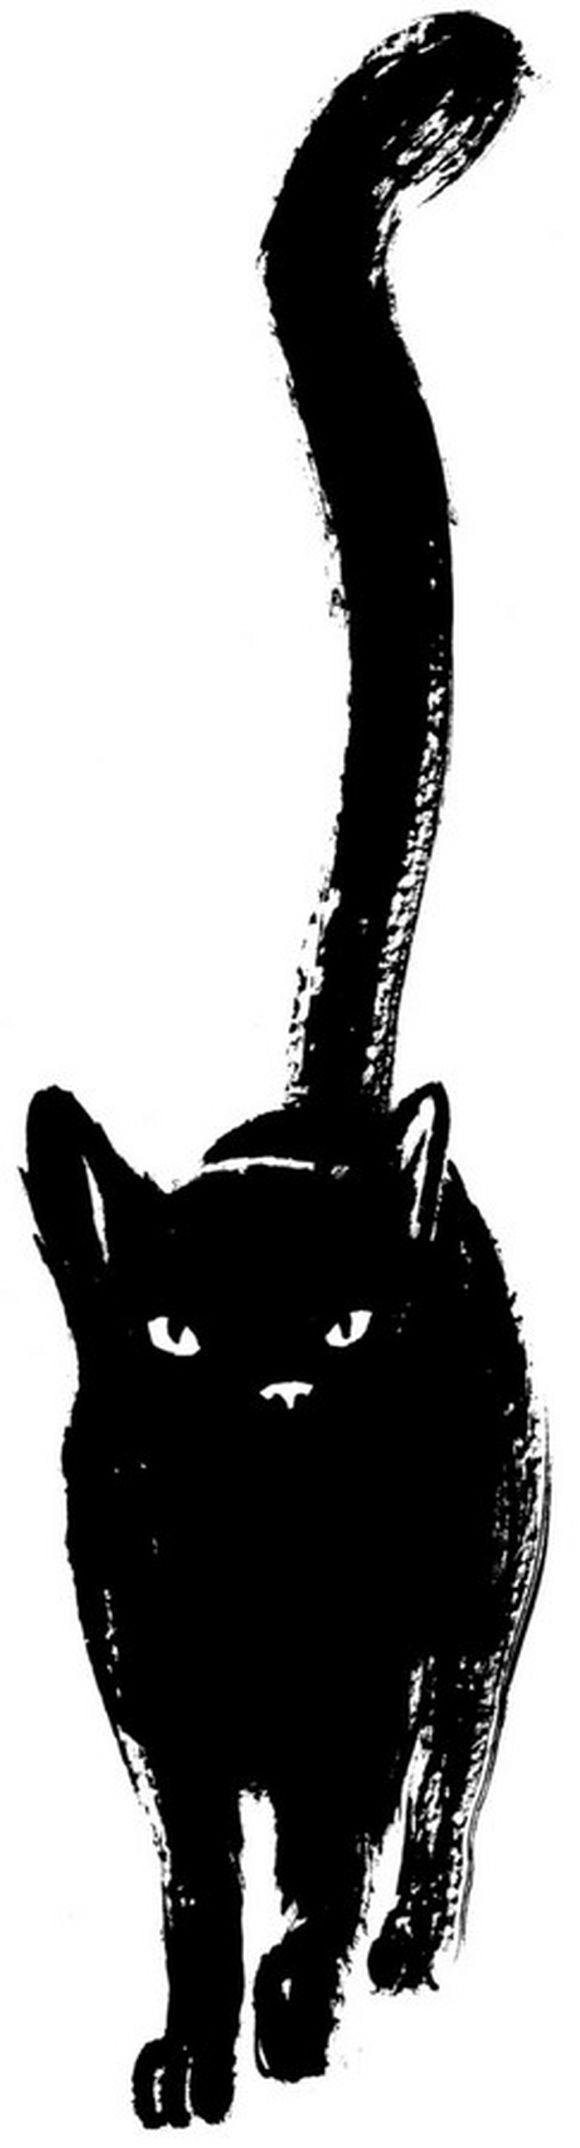 blackcat23